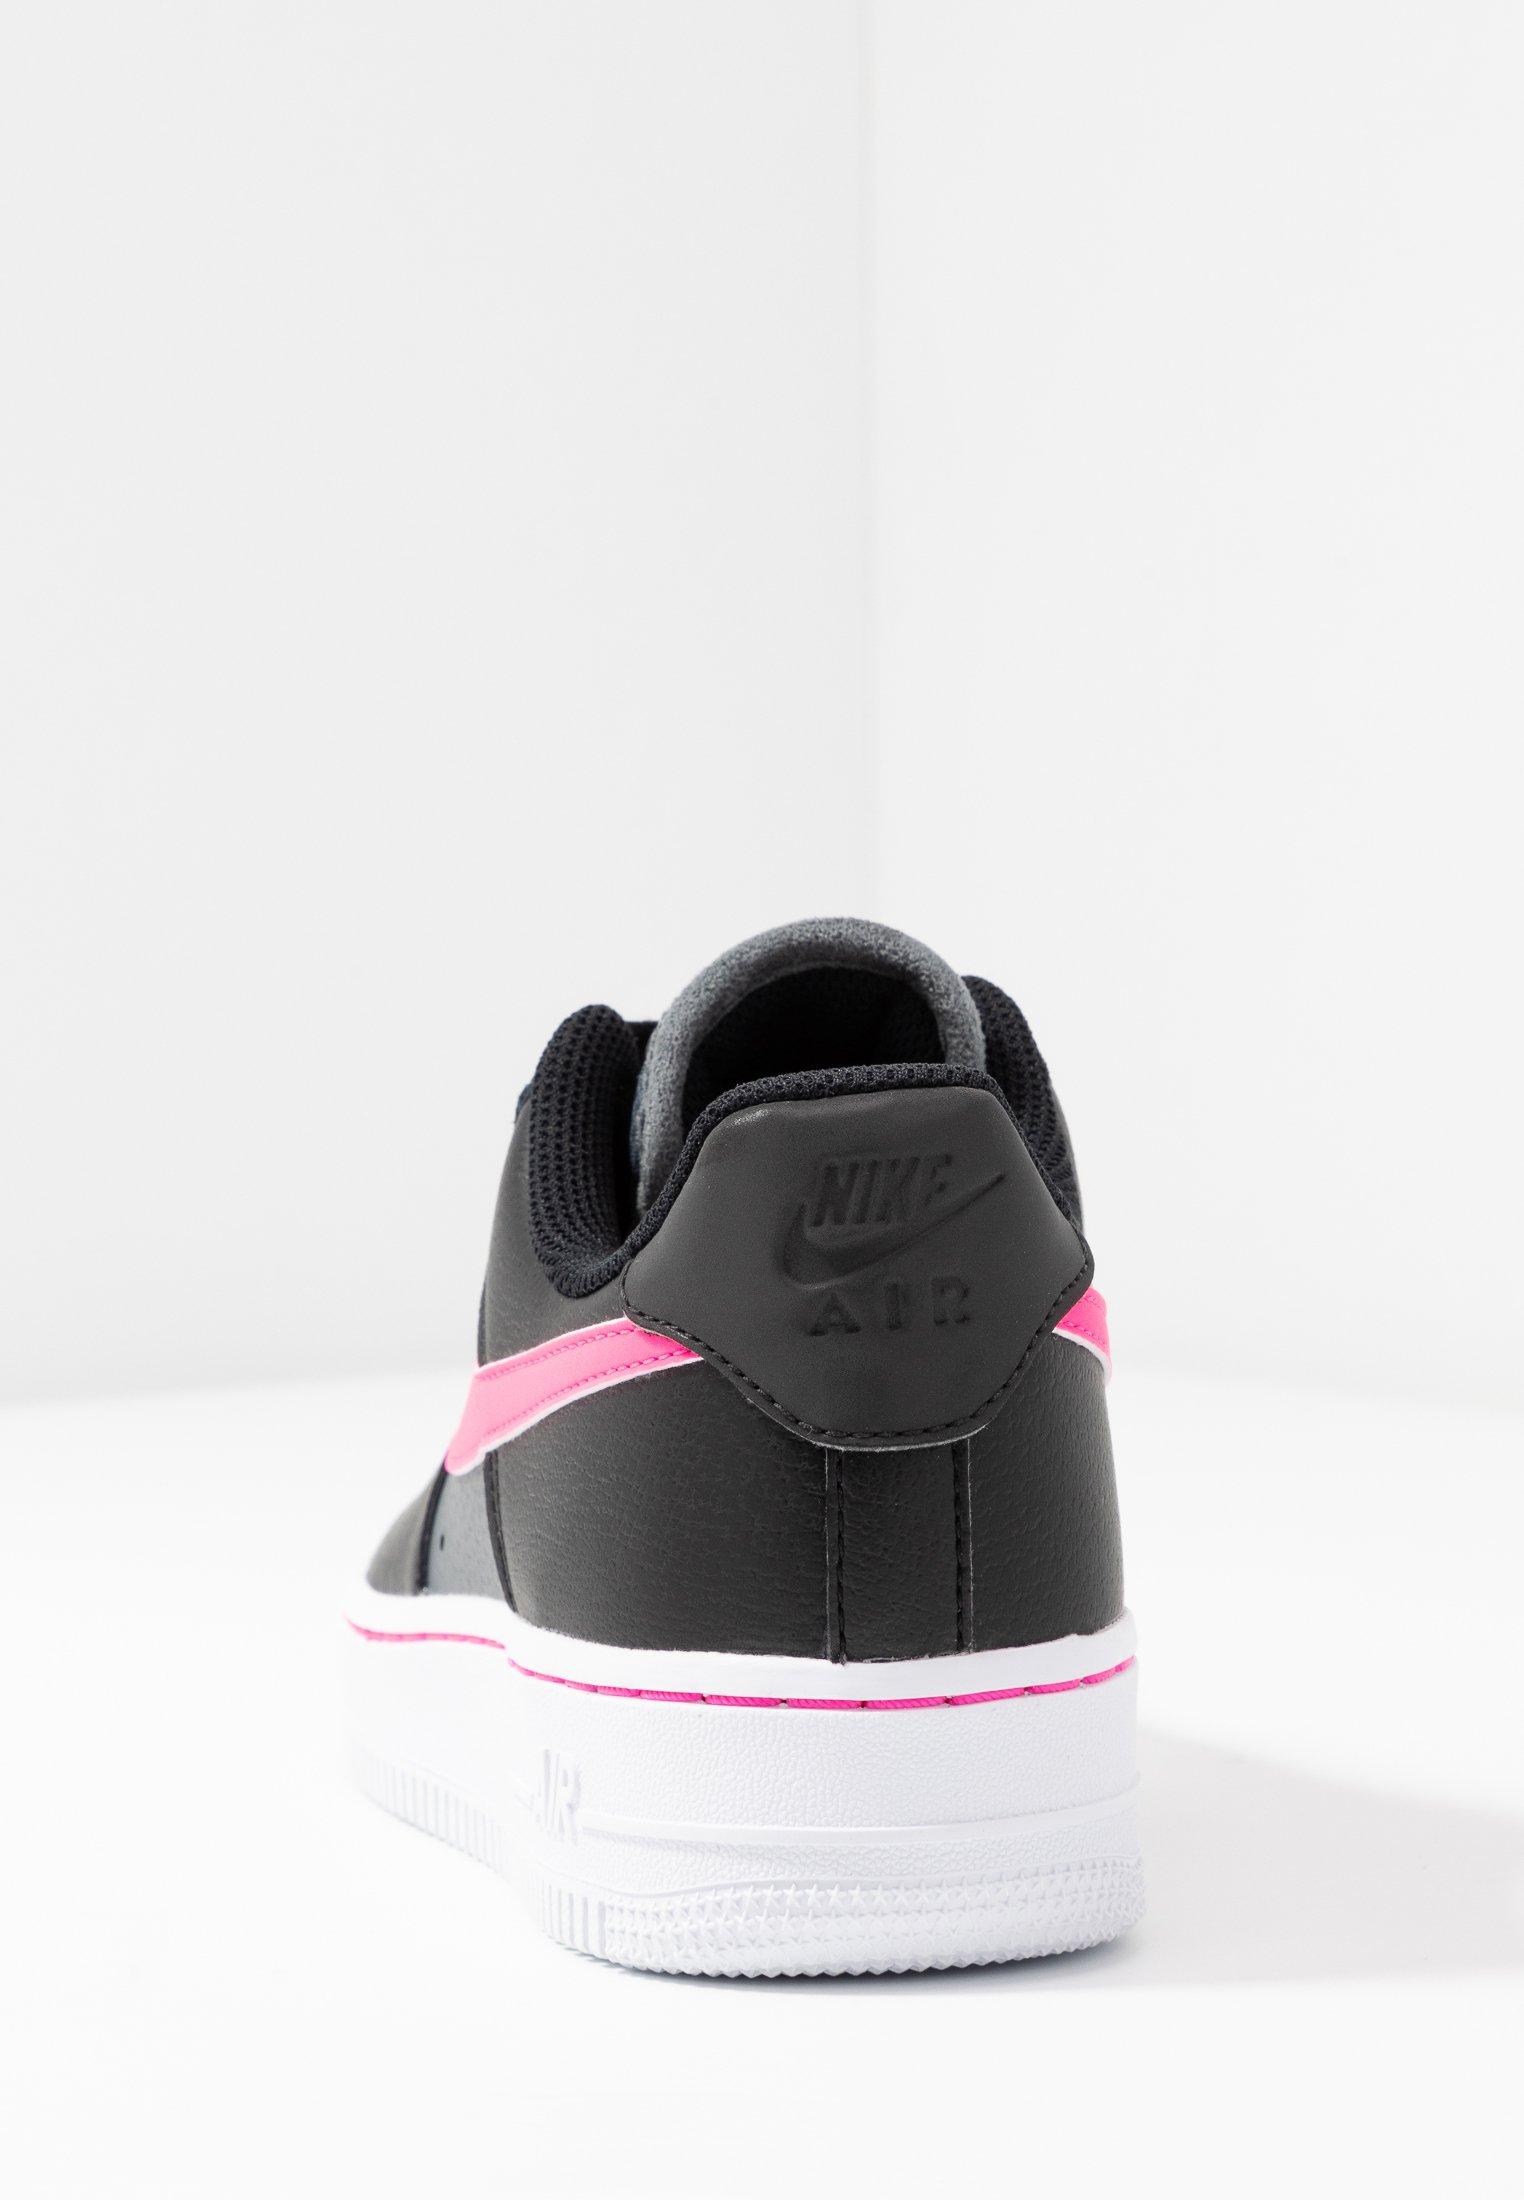 Nike Women's Air Force 1 Lo BlackPink Blast Dark Grey